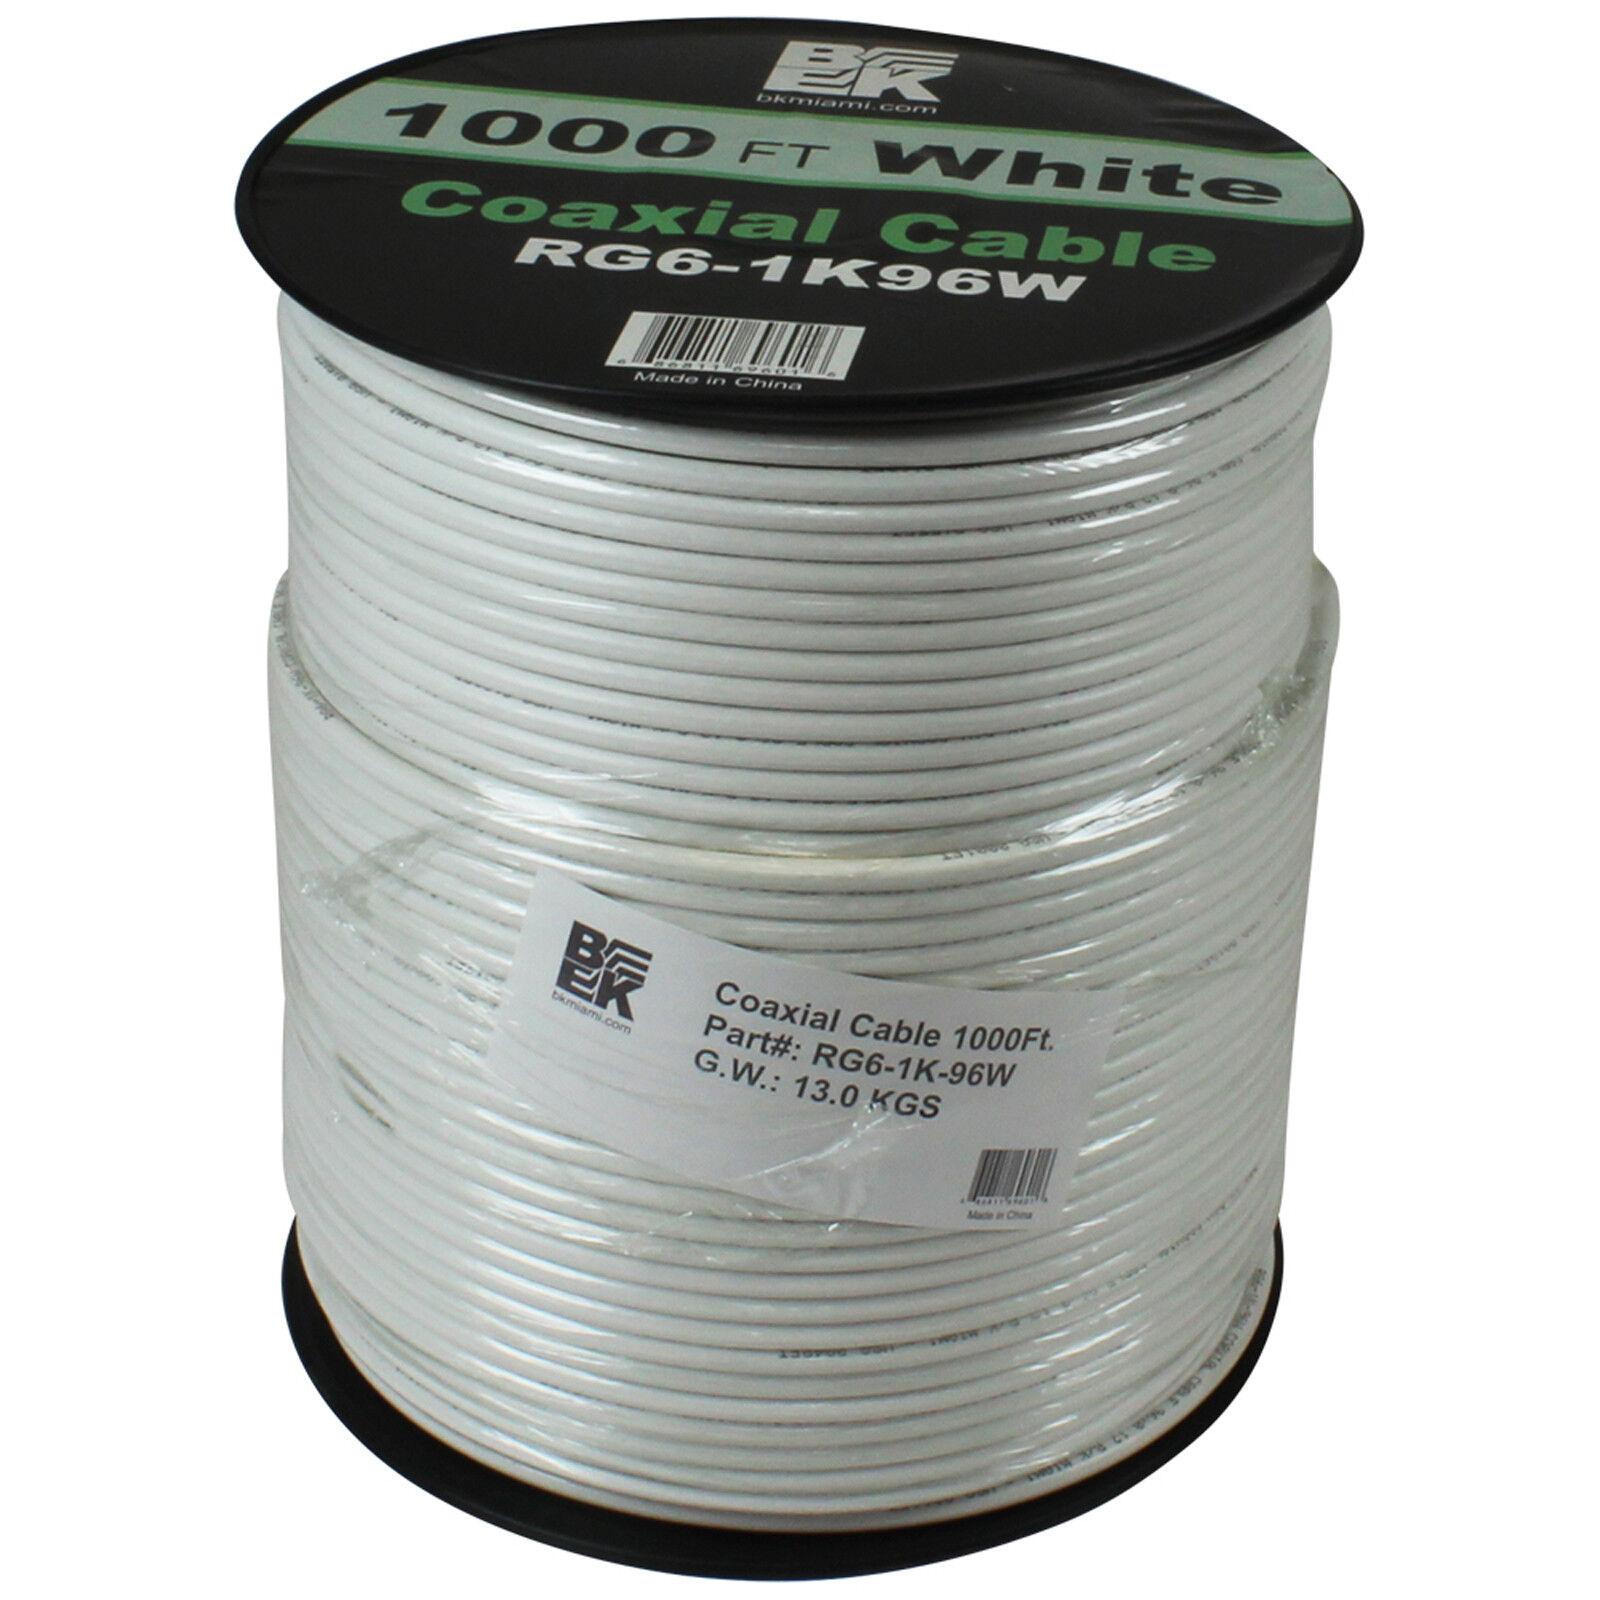 1000' Pies De Cable Coaxial Coaxial Coaxial Coaxial RG6 18AWG Carrete de Alambre de TV satelital-blancoo  mejor precio